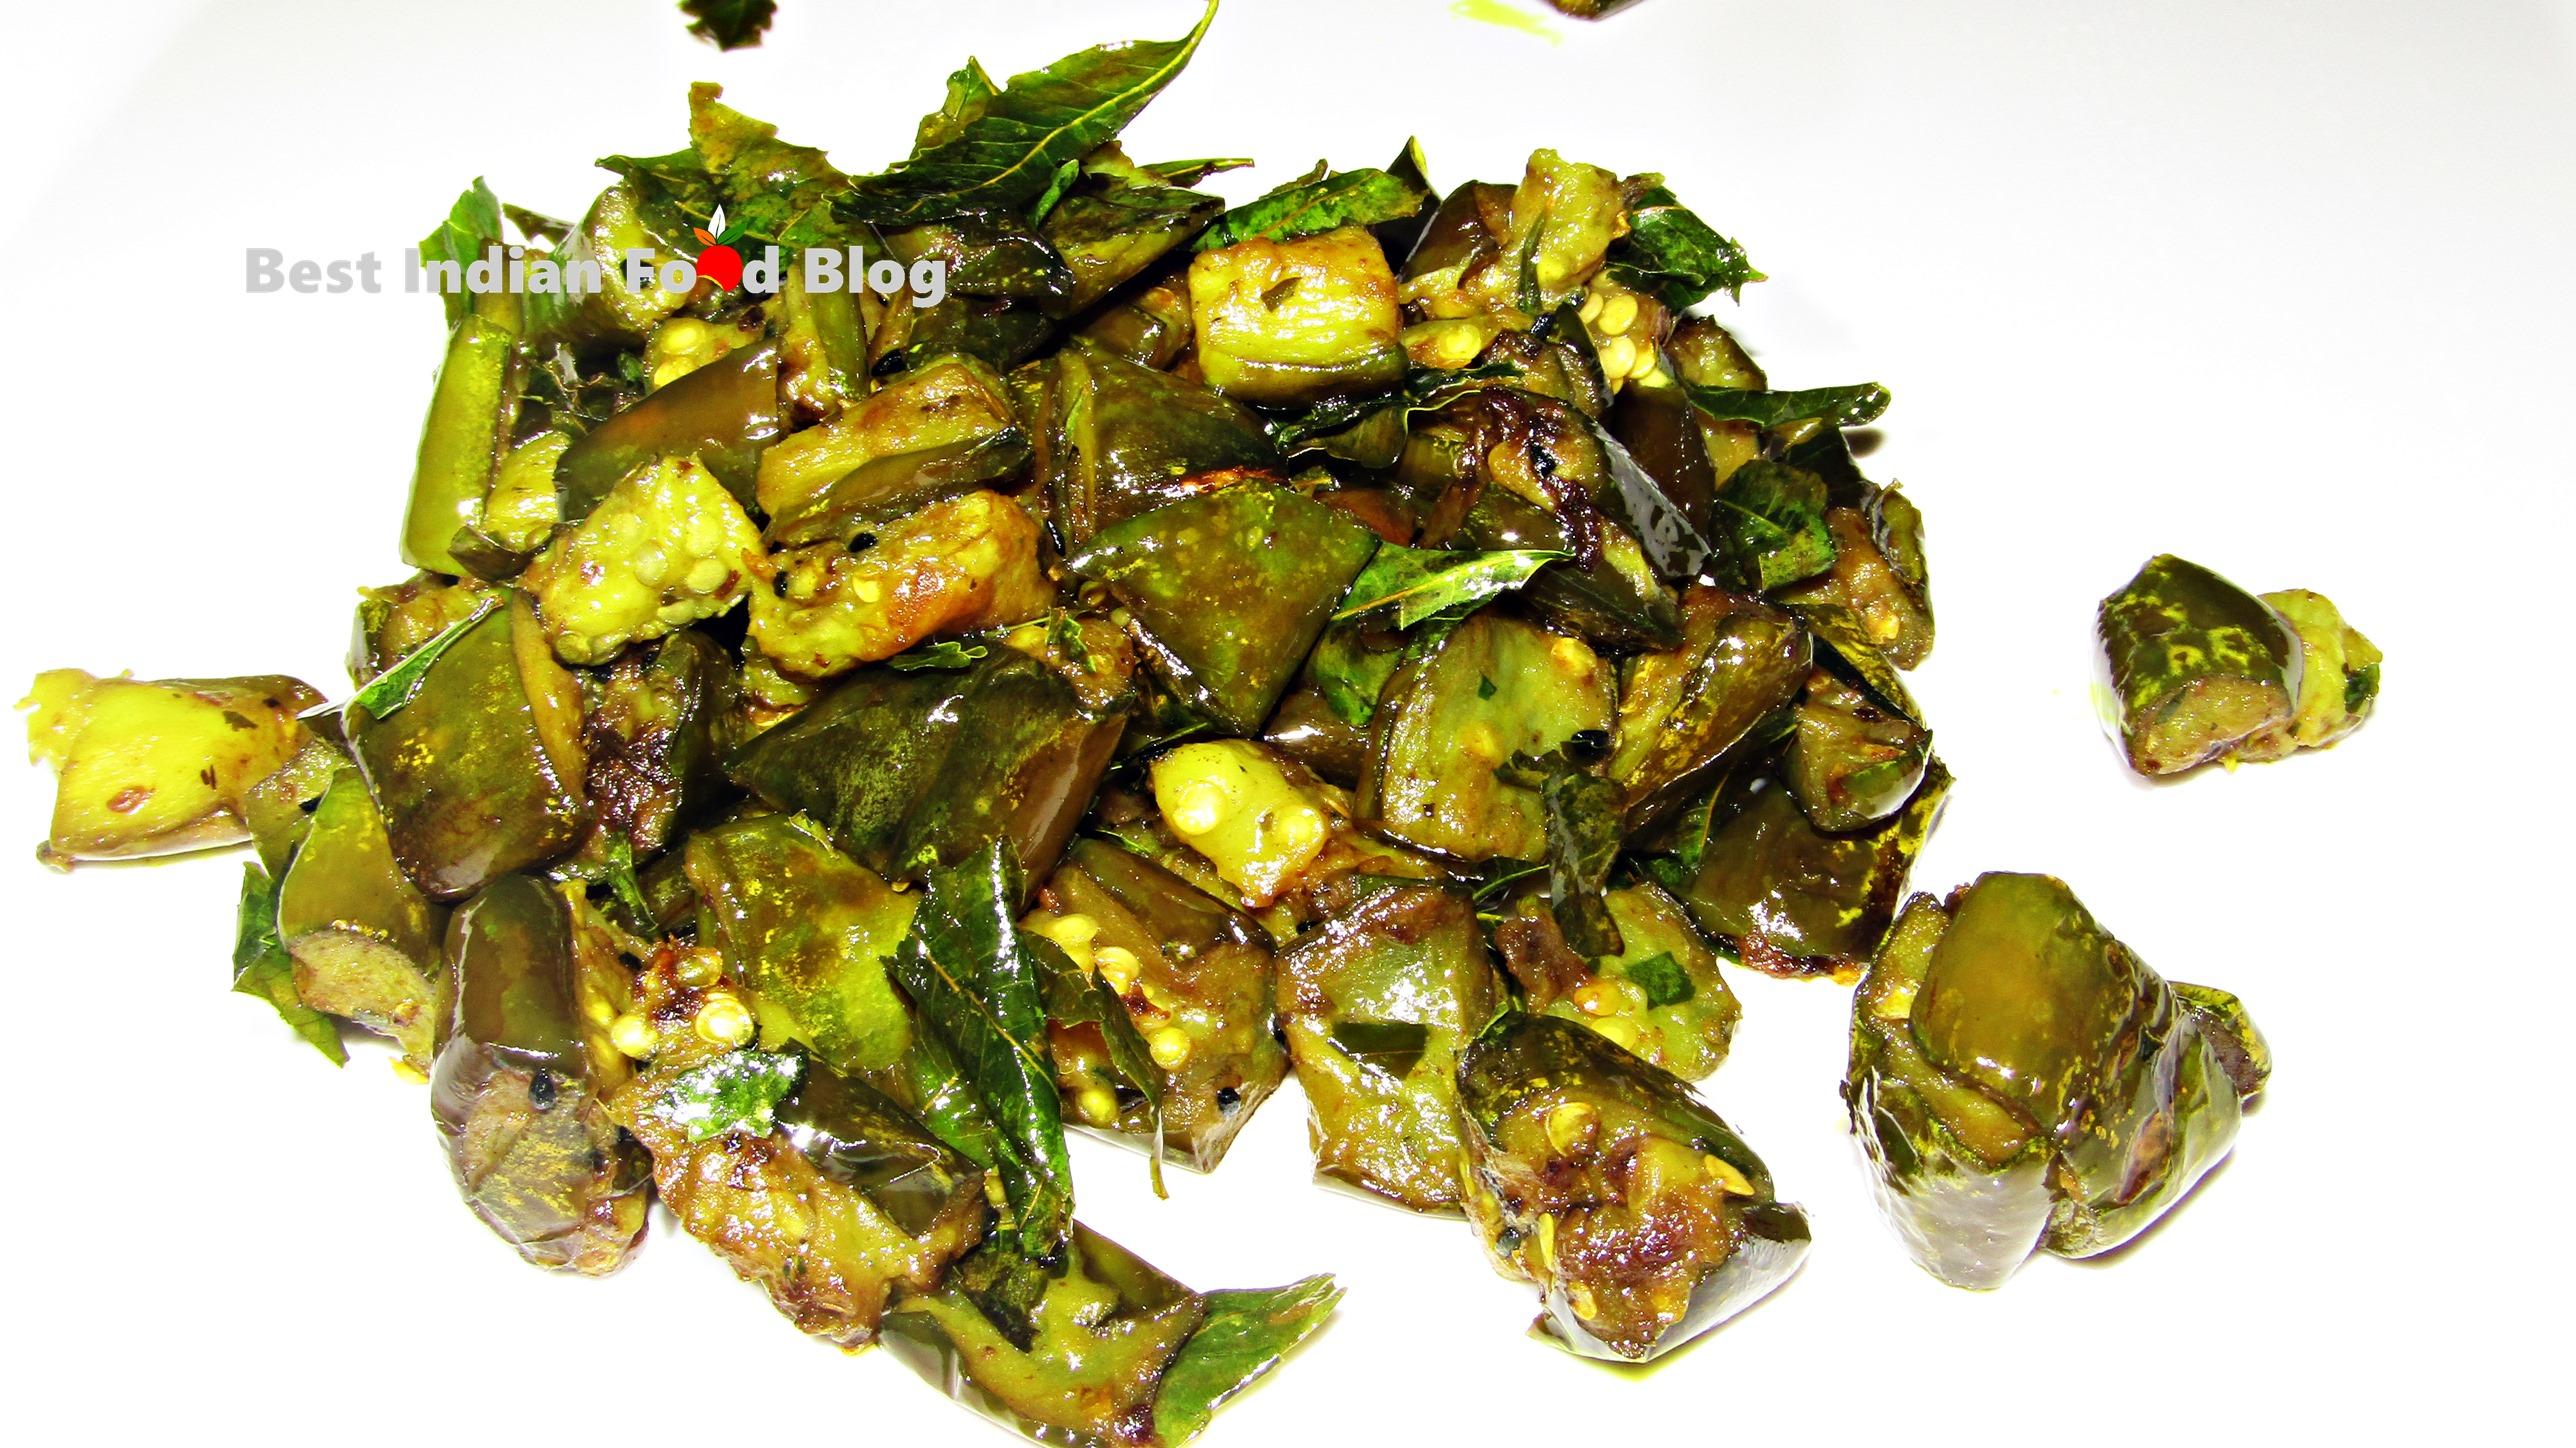 Neem Begun from West Bengal, India | Best Indian Food Blog | Neem Leaf Aubergine recipe